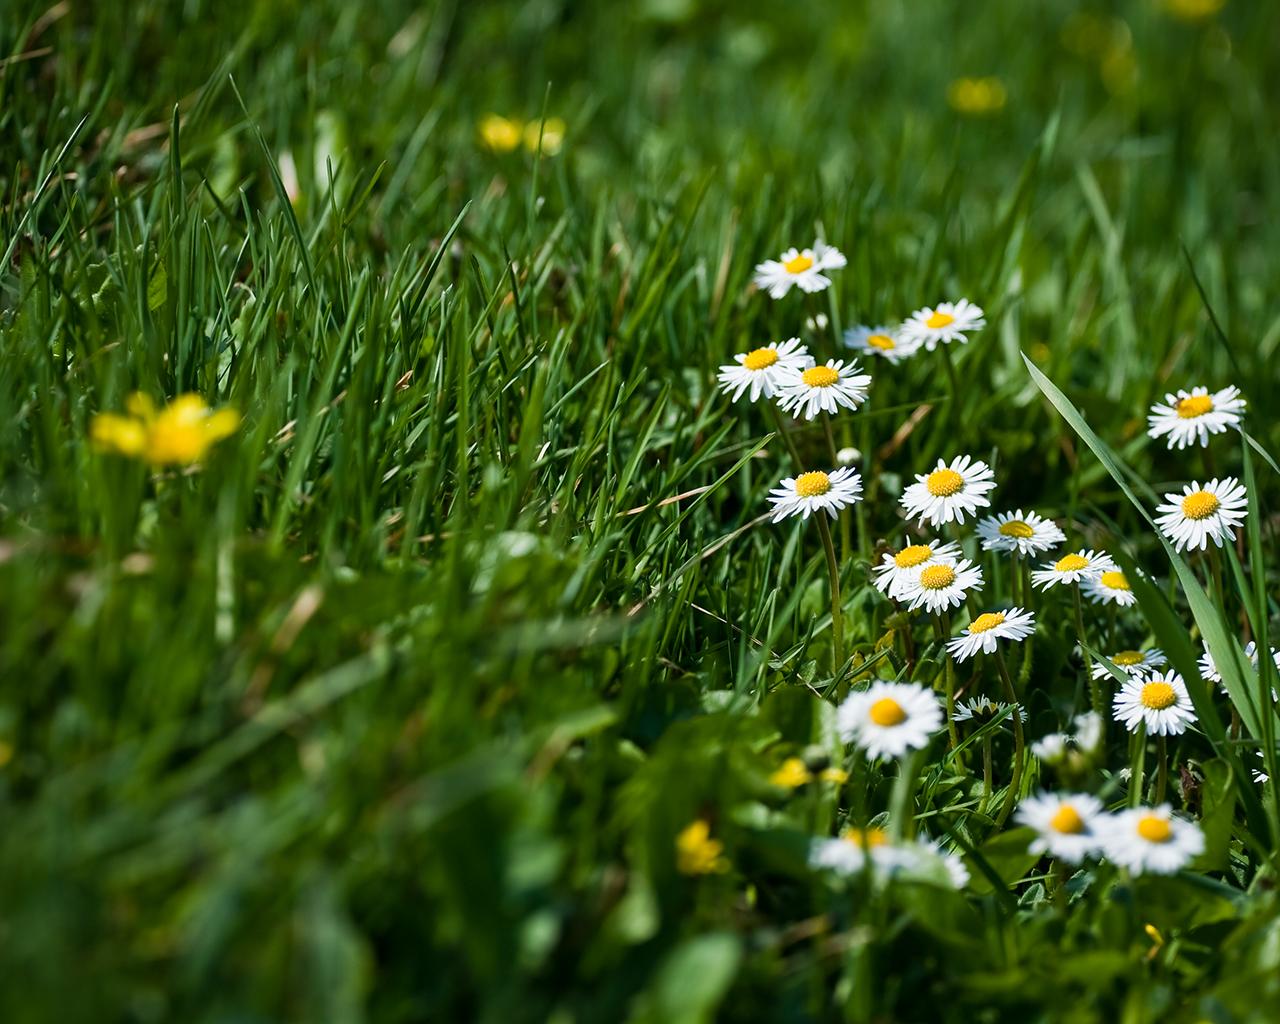 http://2.bp.blogspot.com/-dR14Z4pjMbg/TmTAZI4VqHI/AAAAAAAAAeE/NWtY0dH795w/s1600/Wallpapers-room_com___spring_calling_wp_by_jokla_1280x1024.jpg